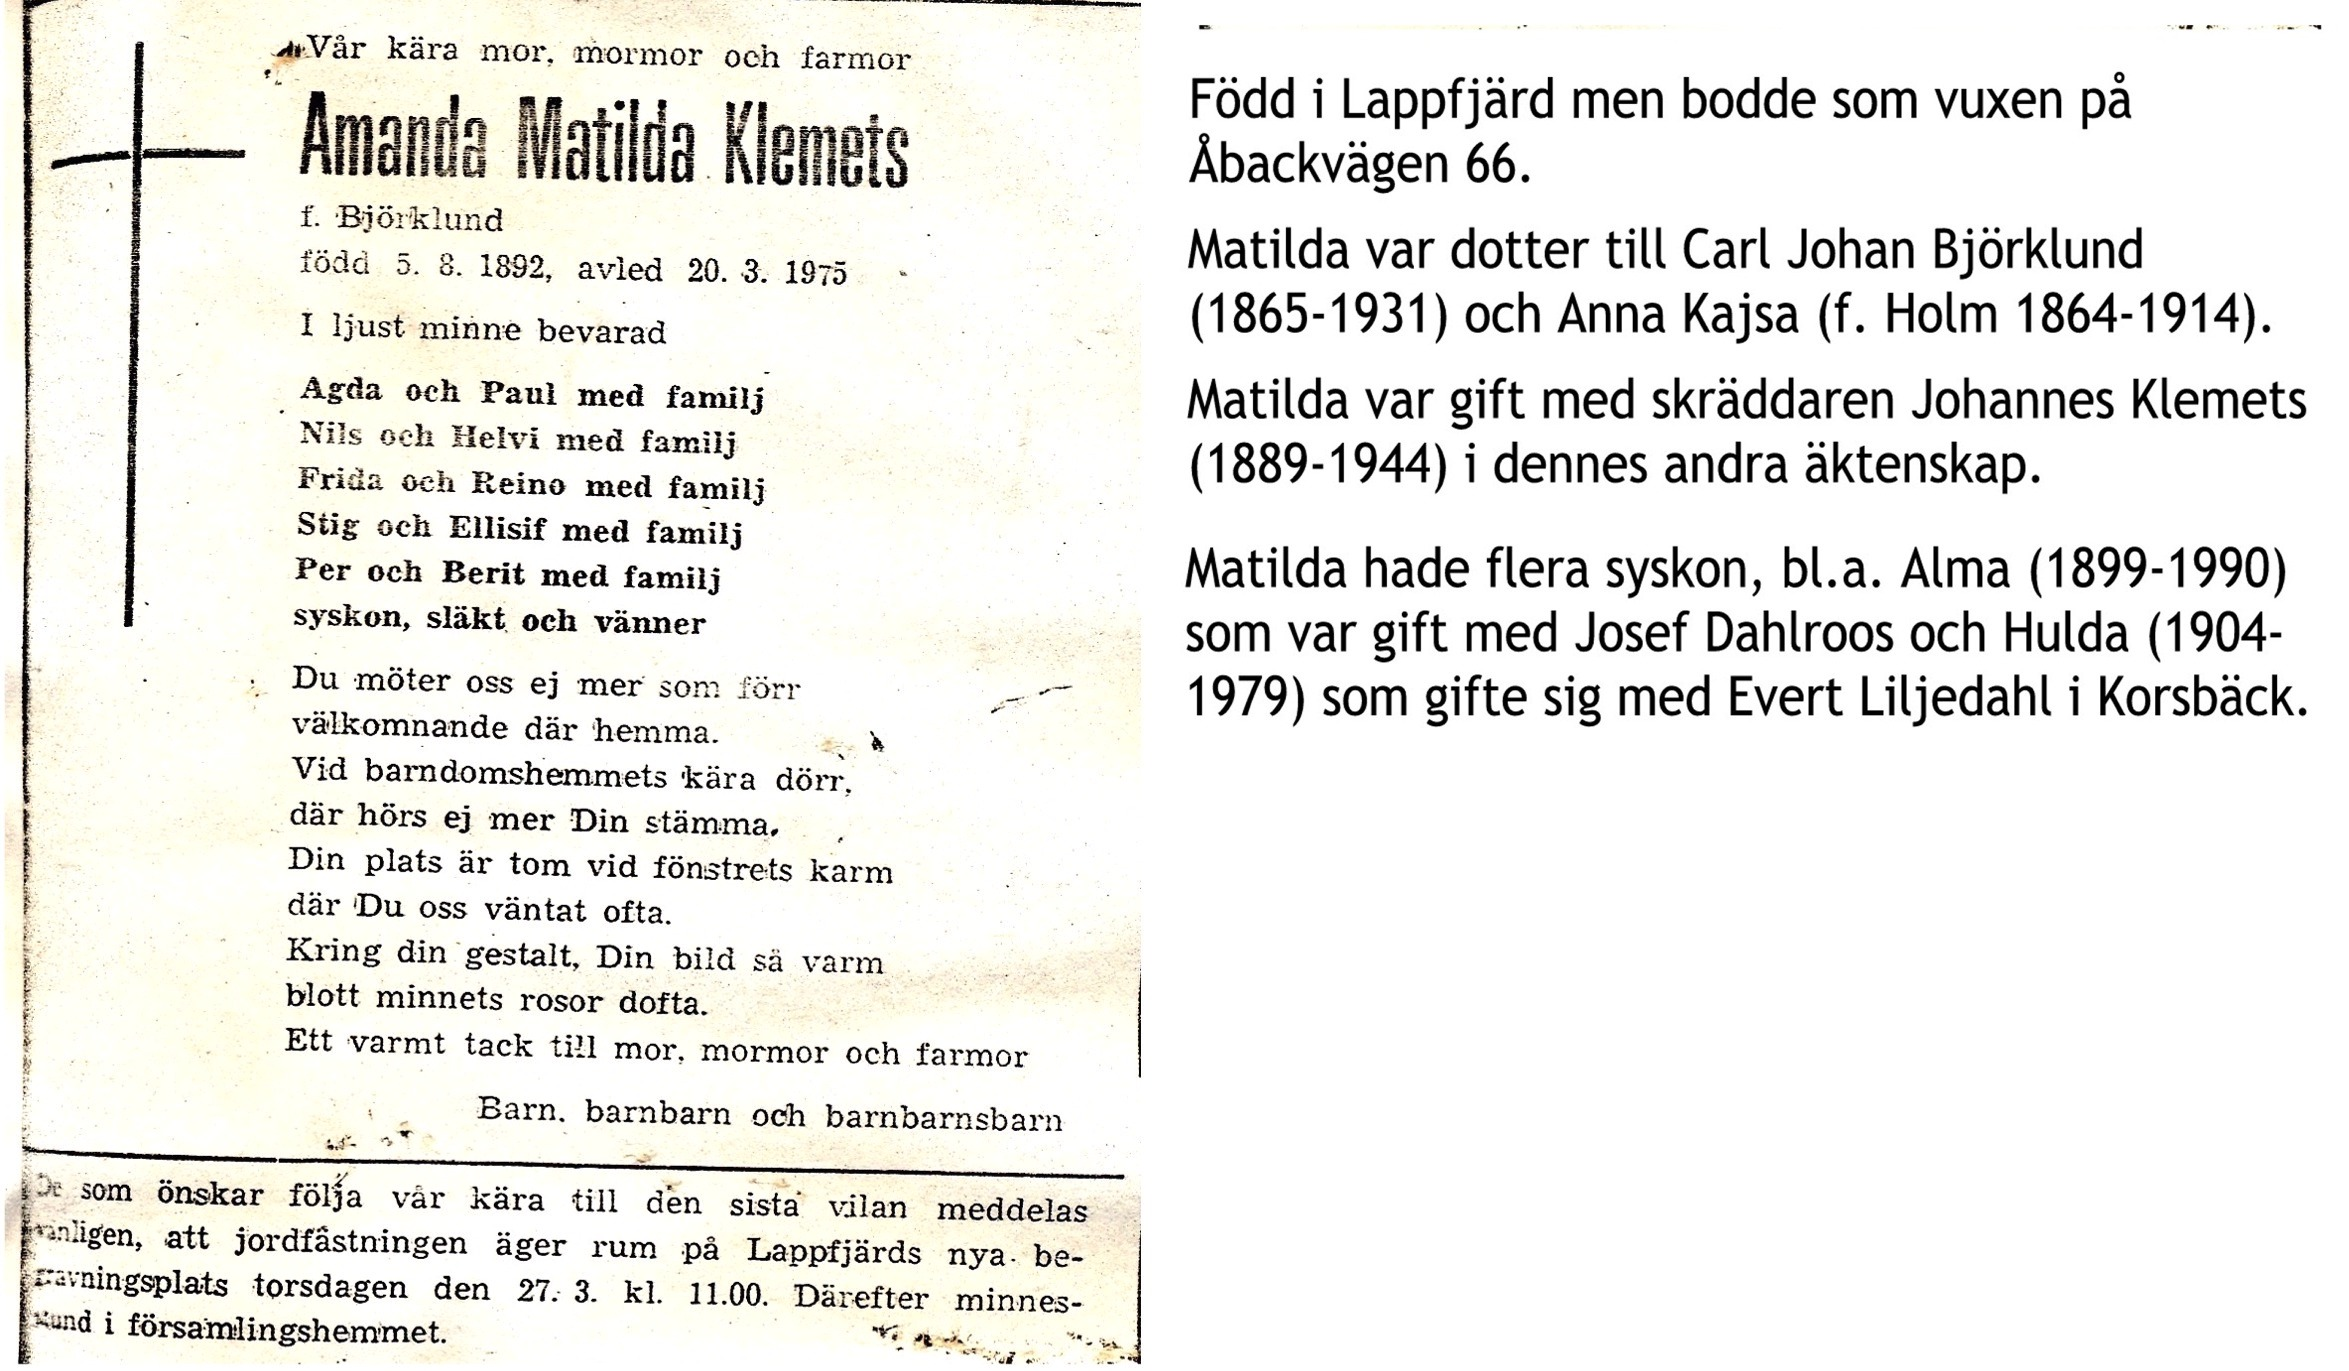 Klemets Matilda